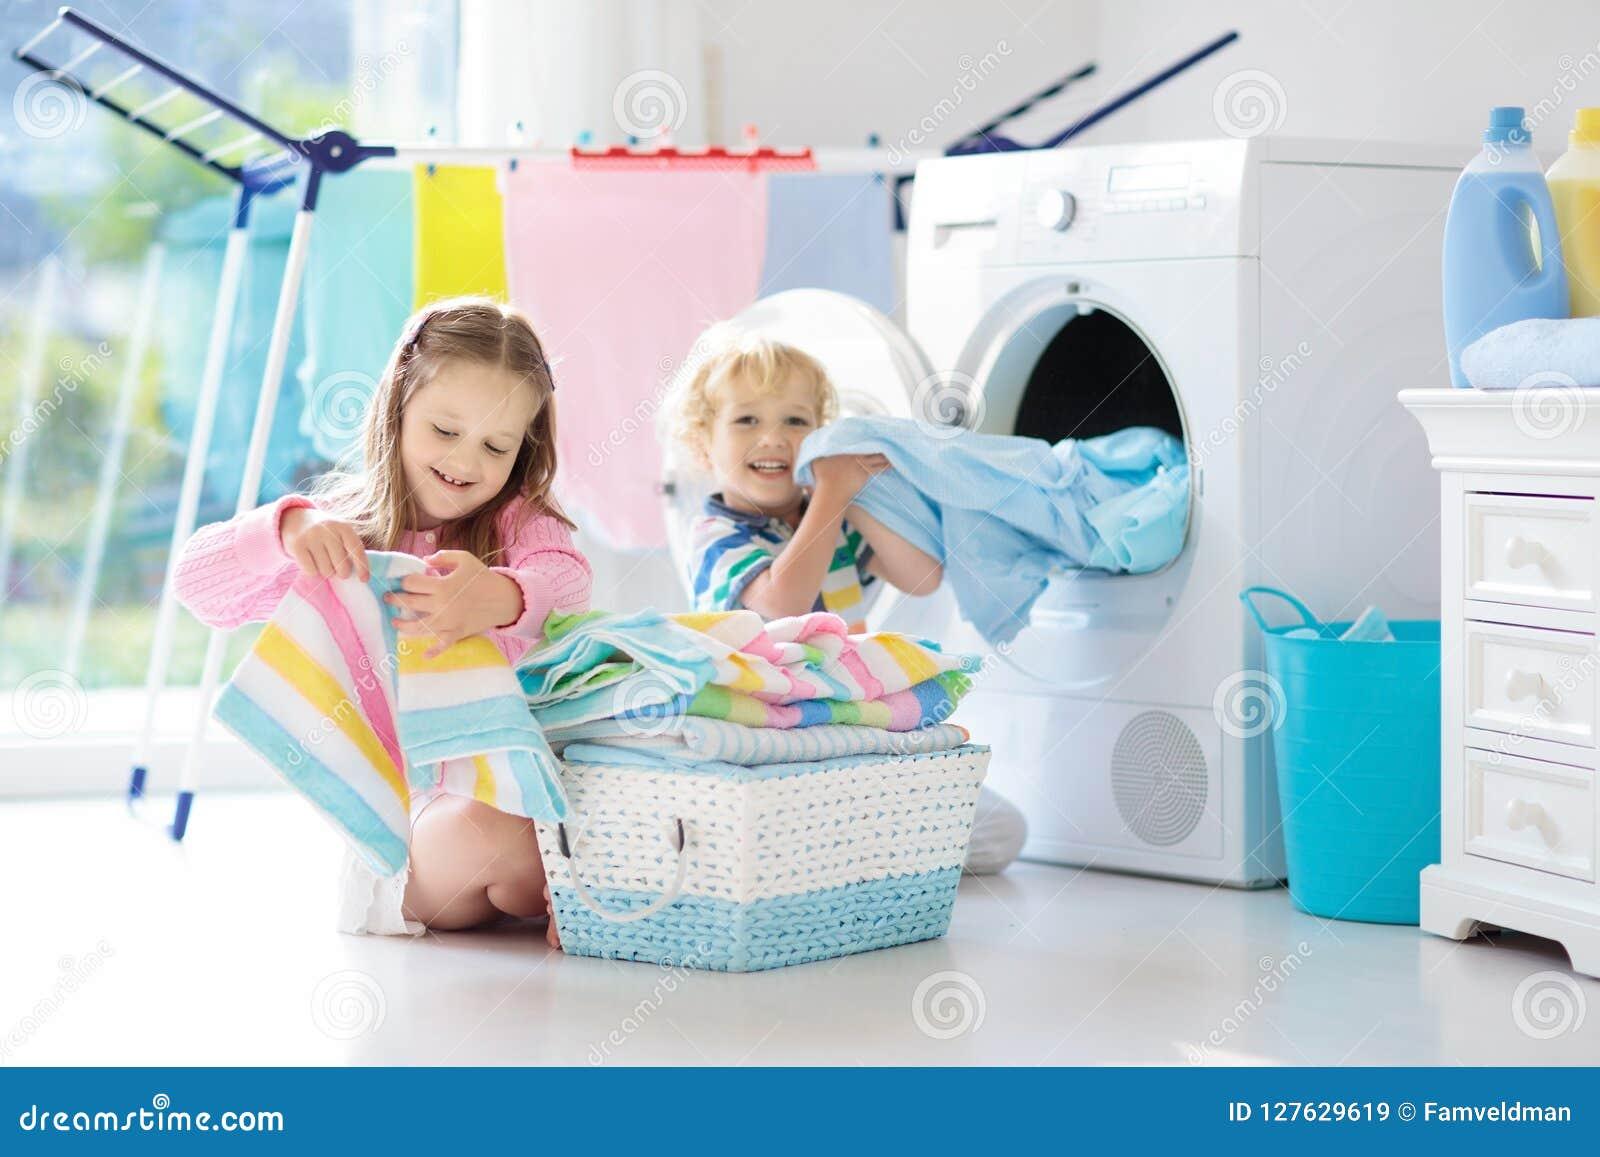 child laudry room 123RF.com